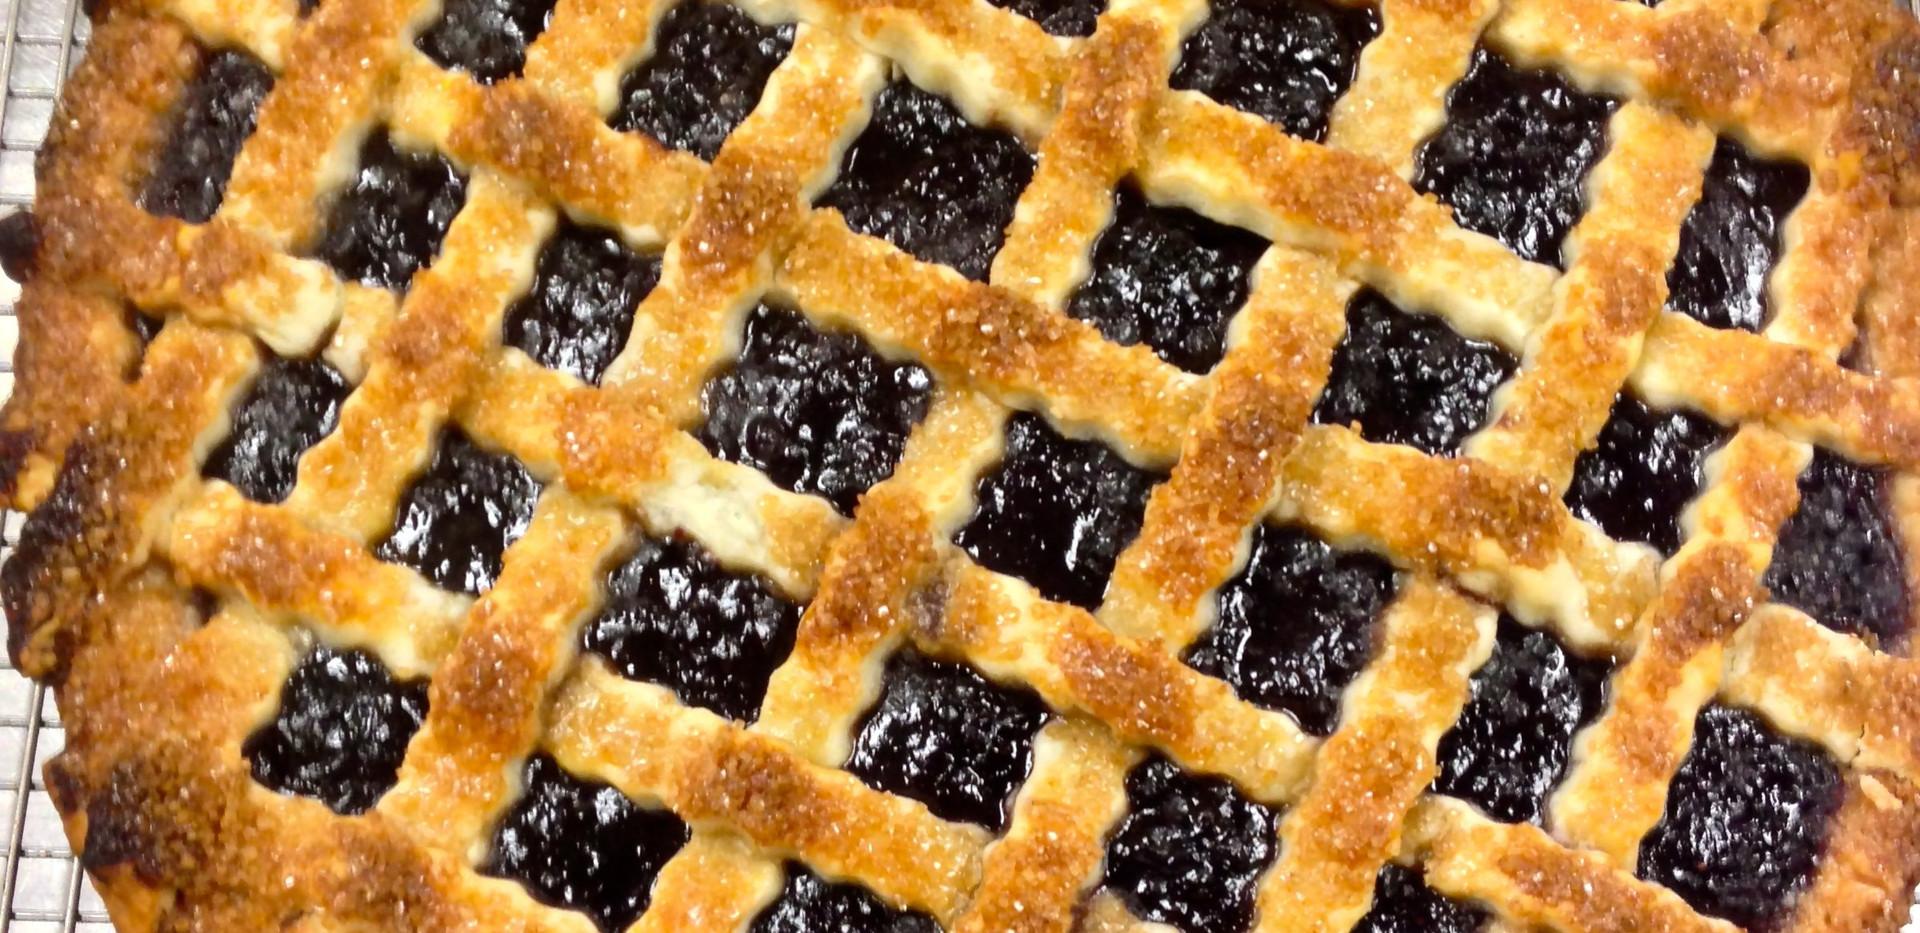 Lattice Cherry Pie | Just the way grandma used to make it